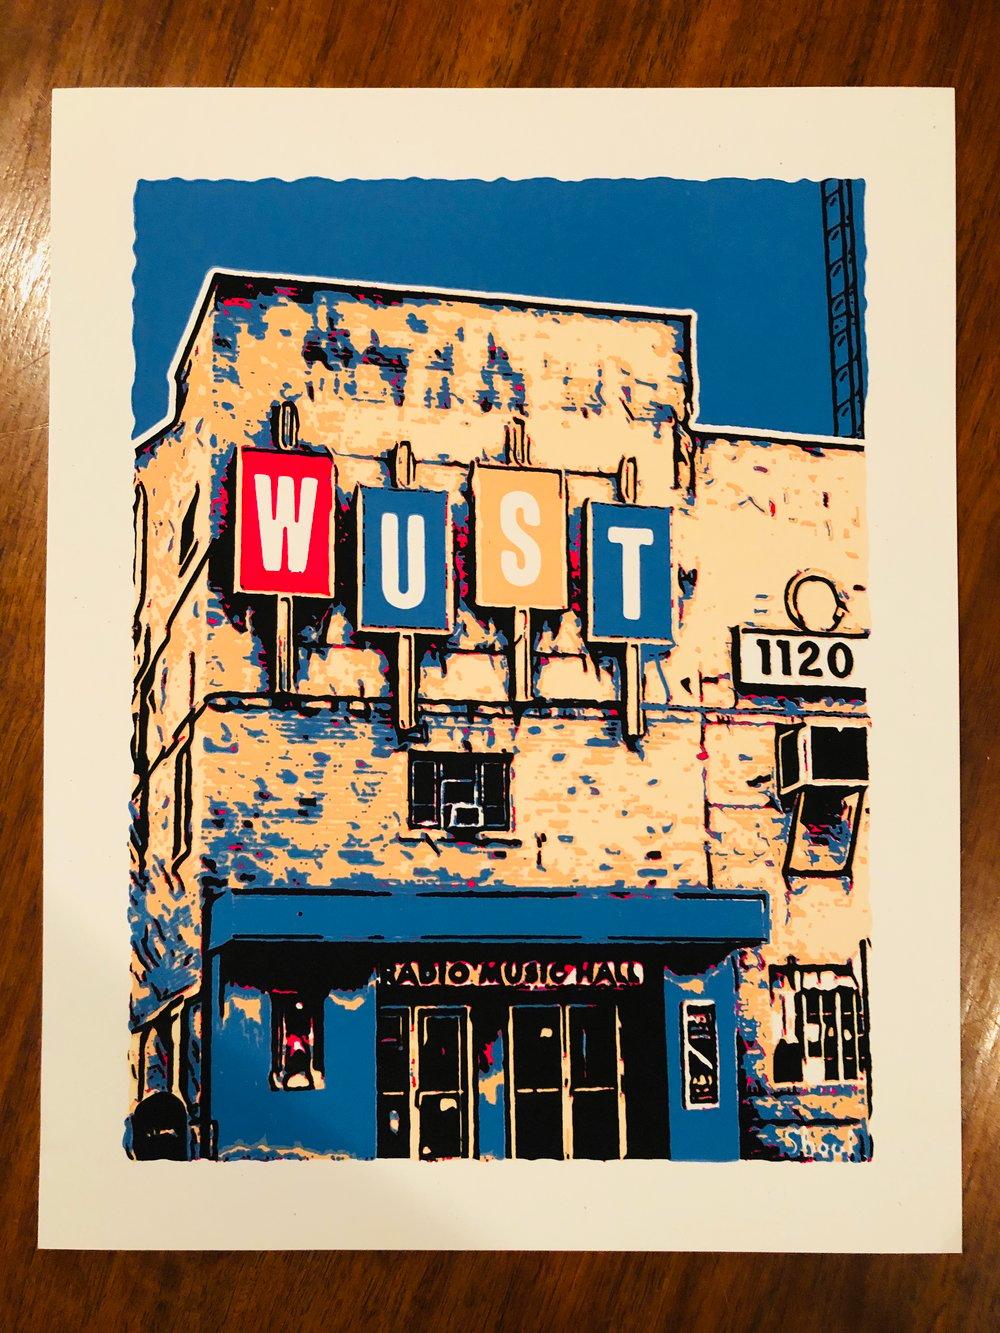 "WUST Radio Music Hall Silk Screened Art Print - 11"" x 14"""